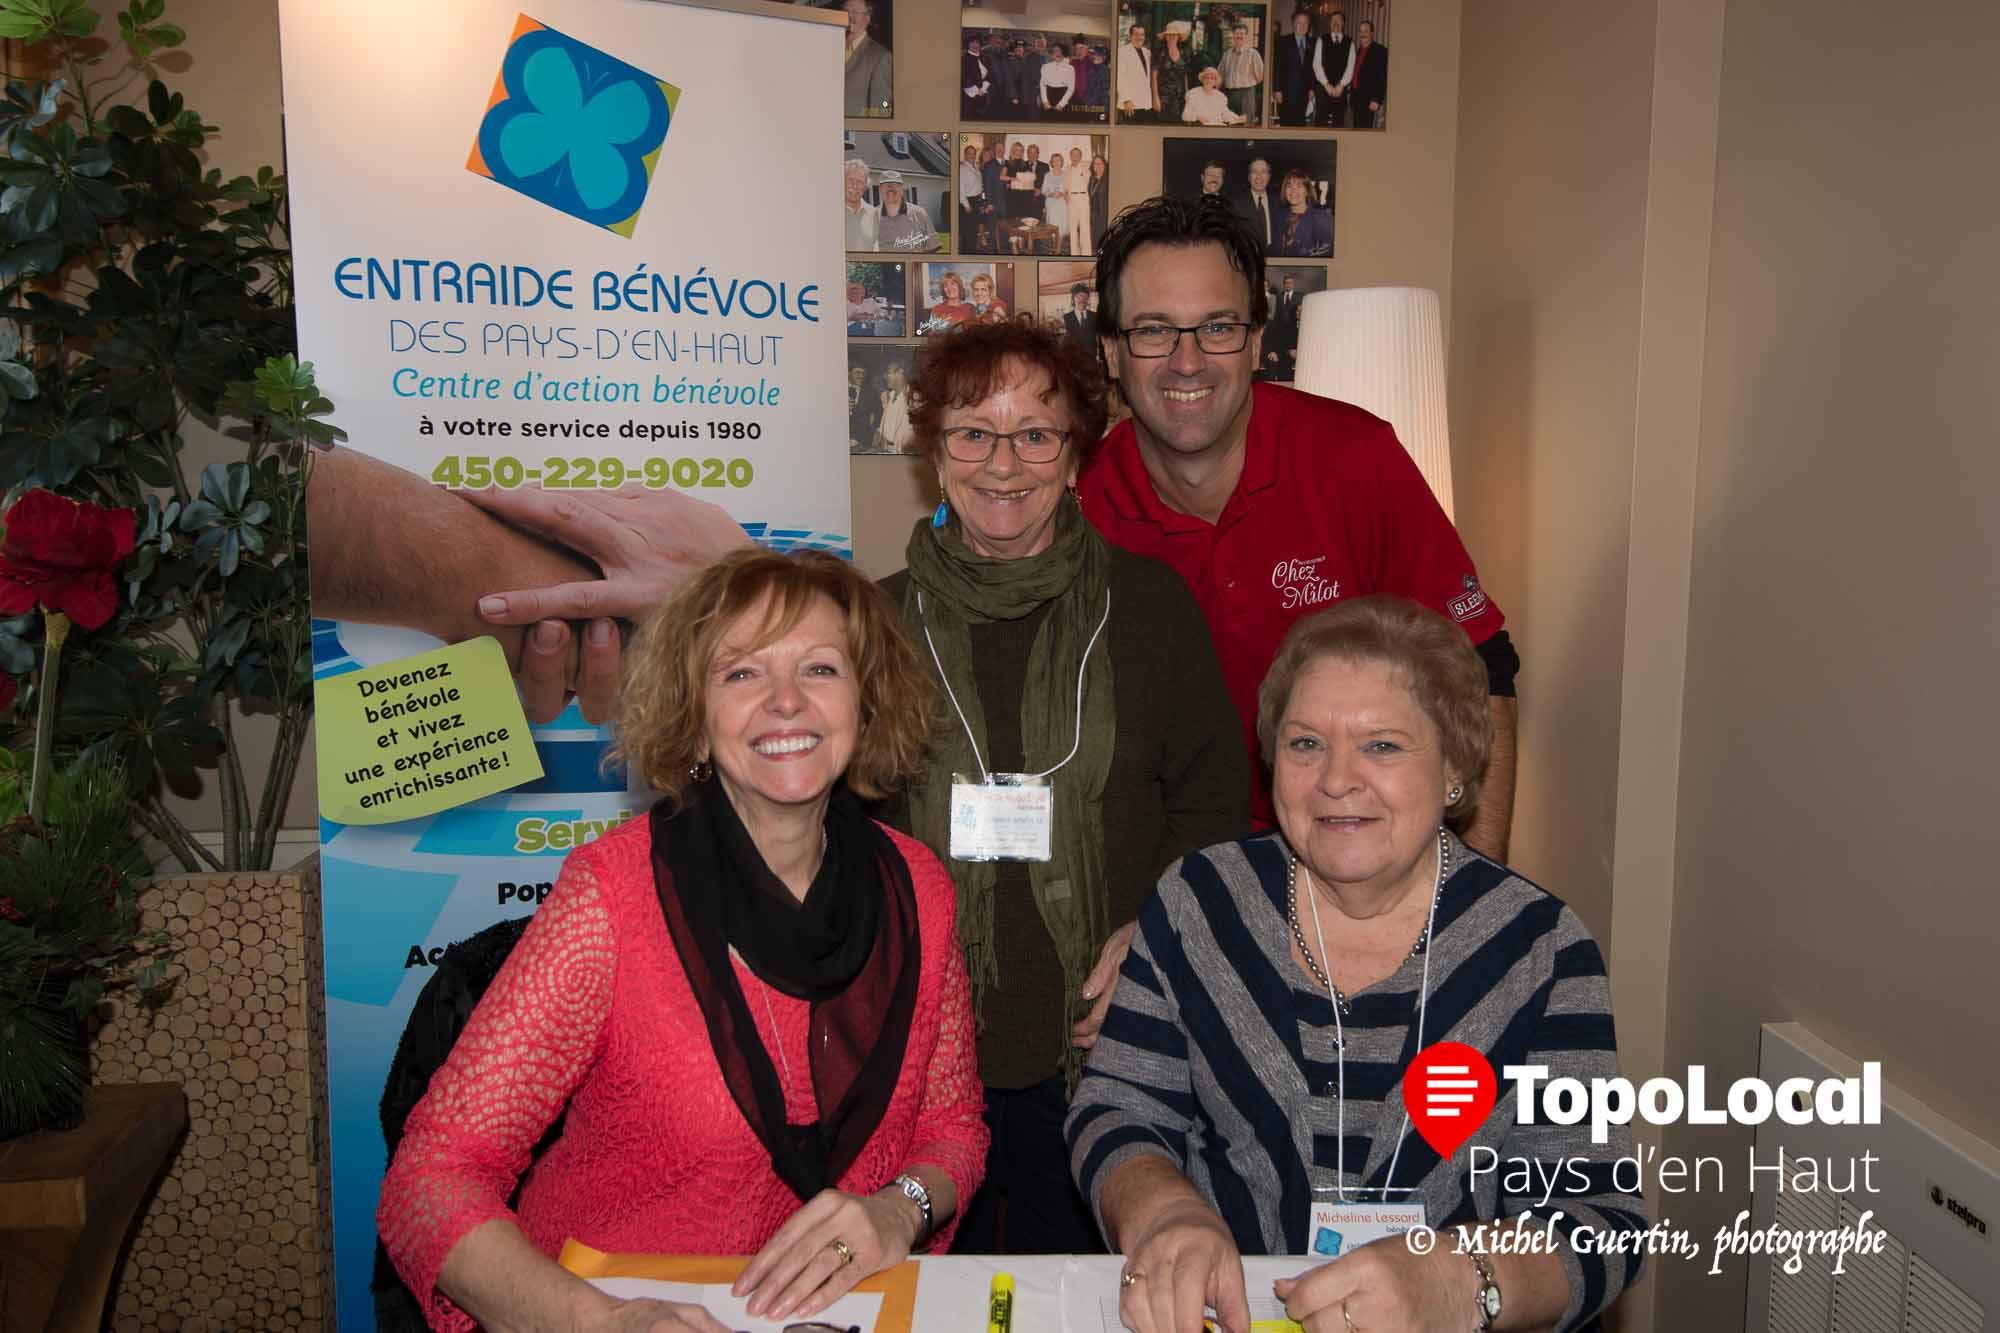 20161123-sainte-adele-entraide-benevole-diner-pates-milot